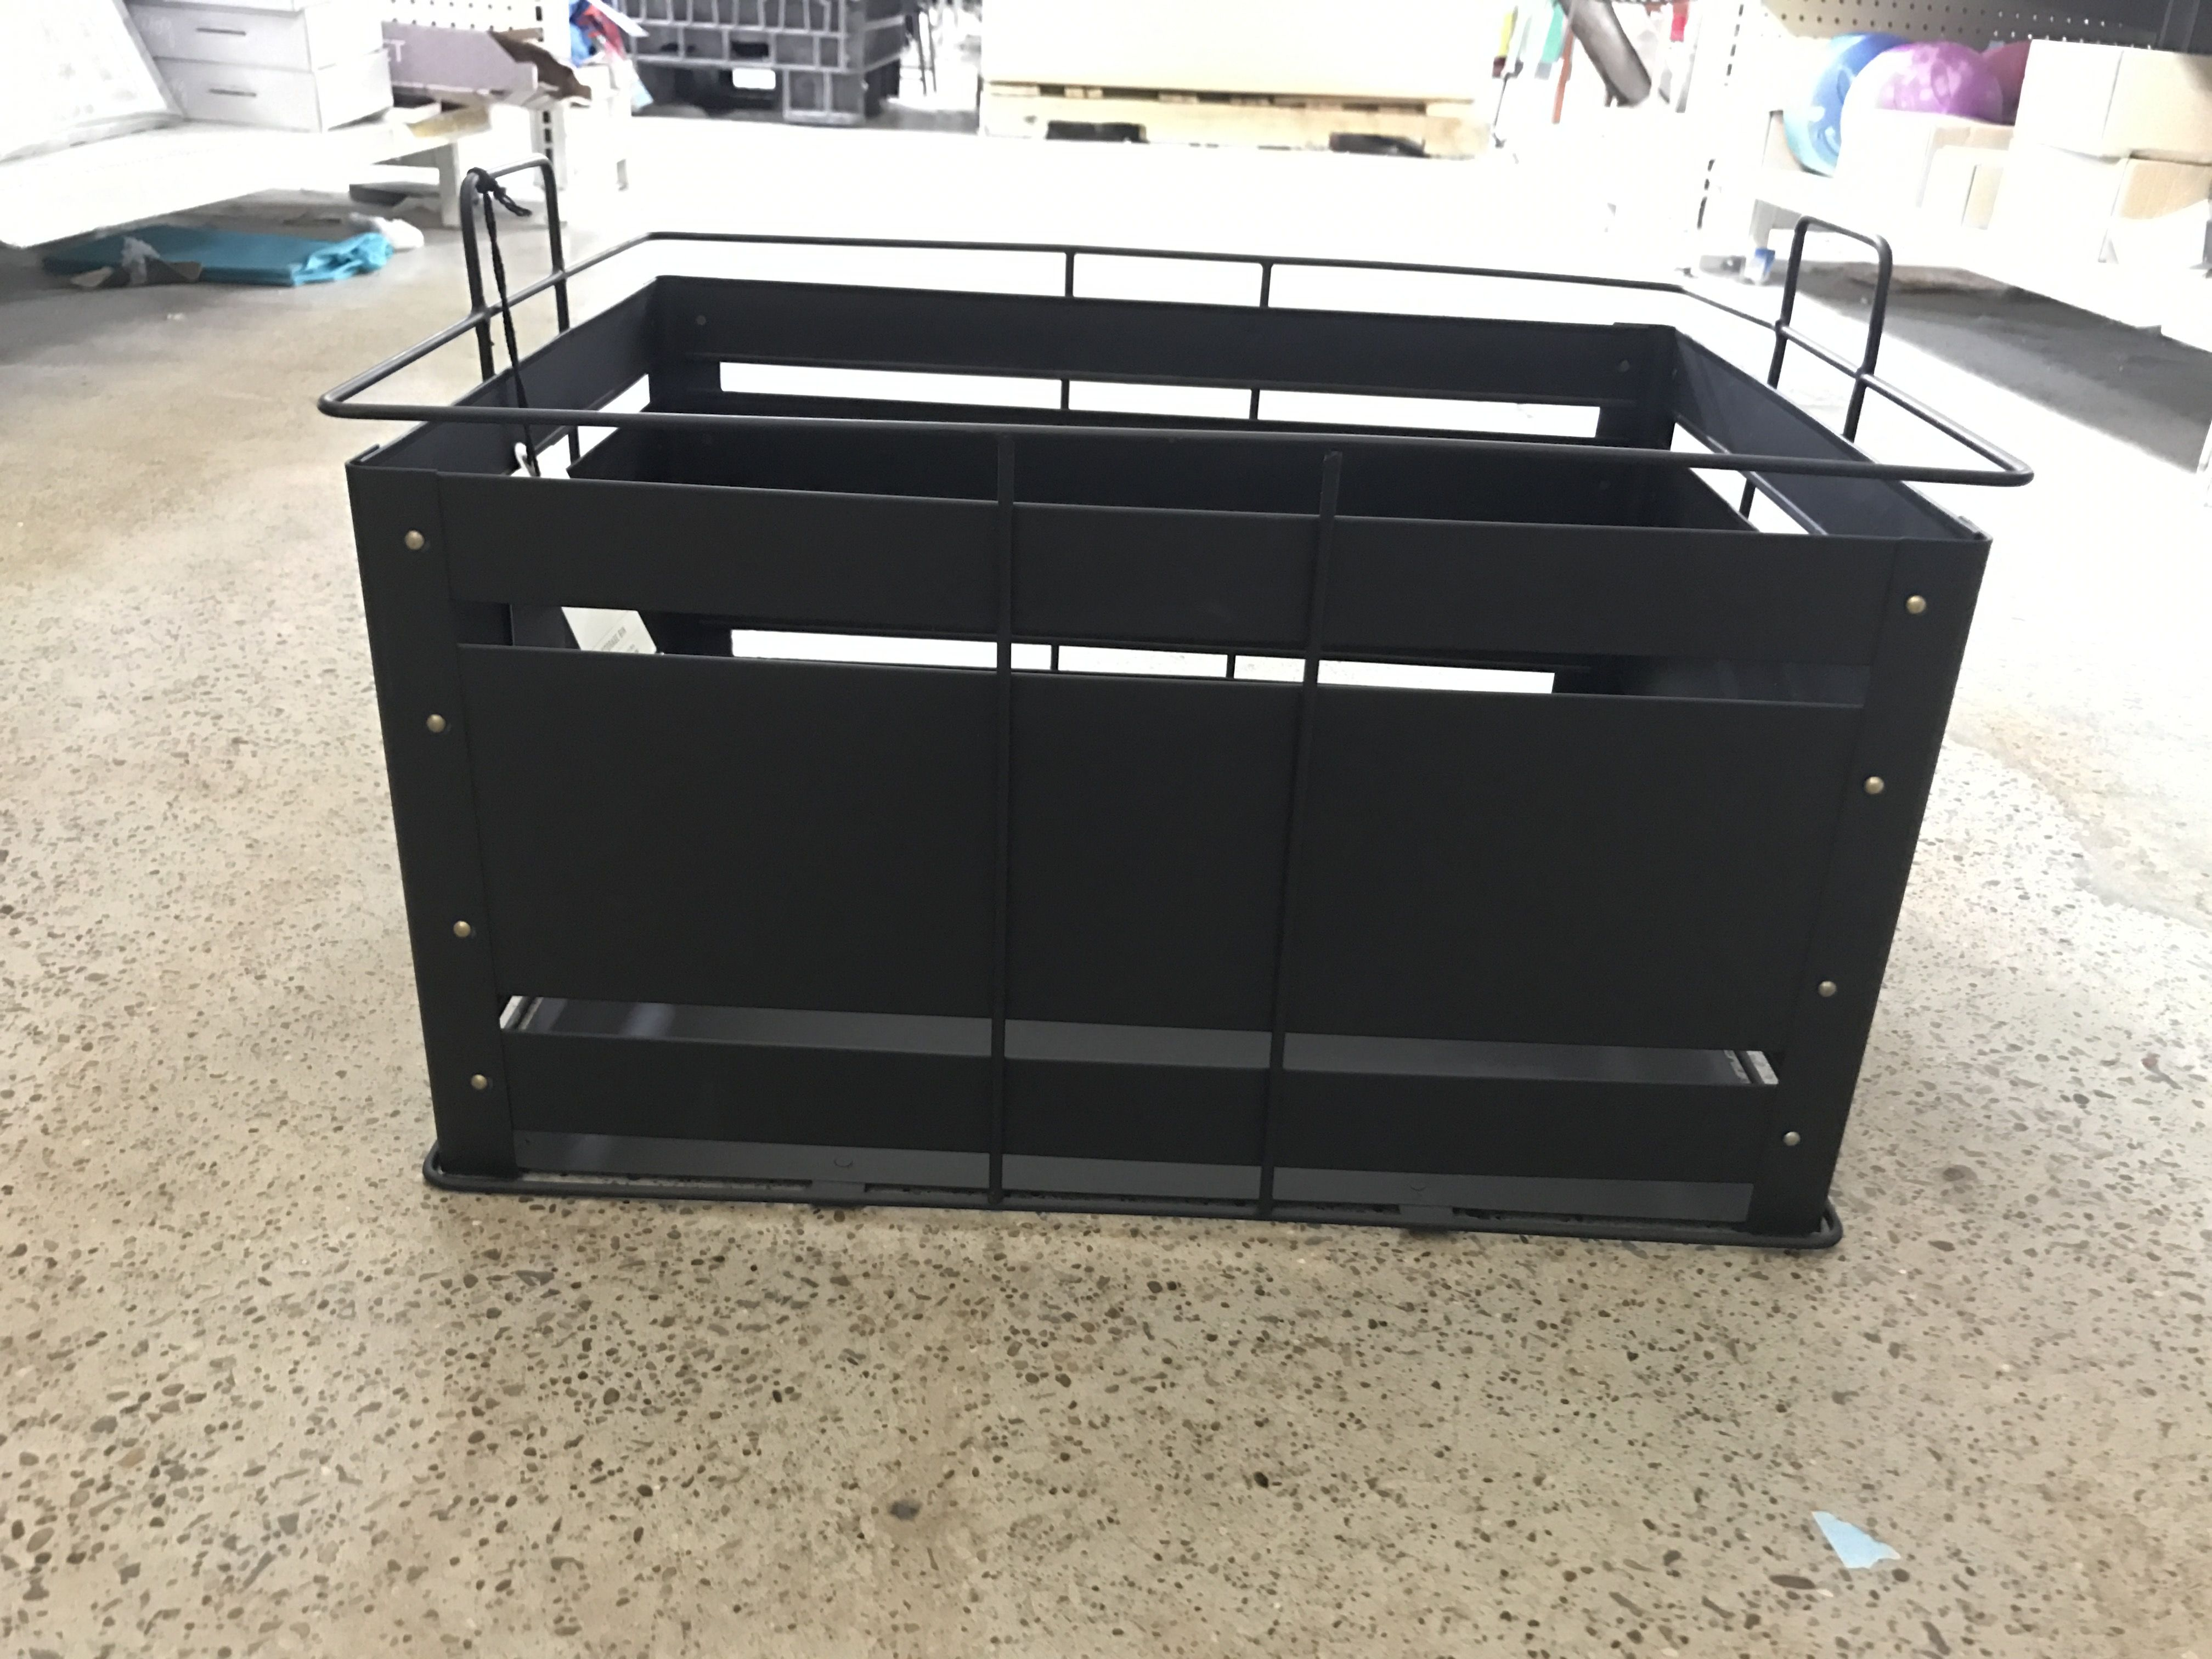 Black W Brass Accent Decorative Metal Bins For Storage